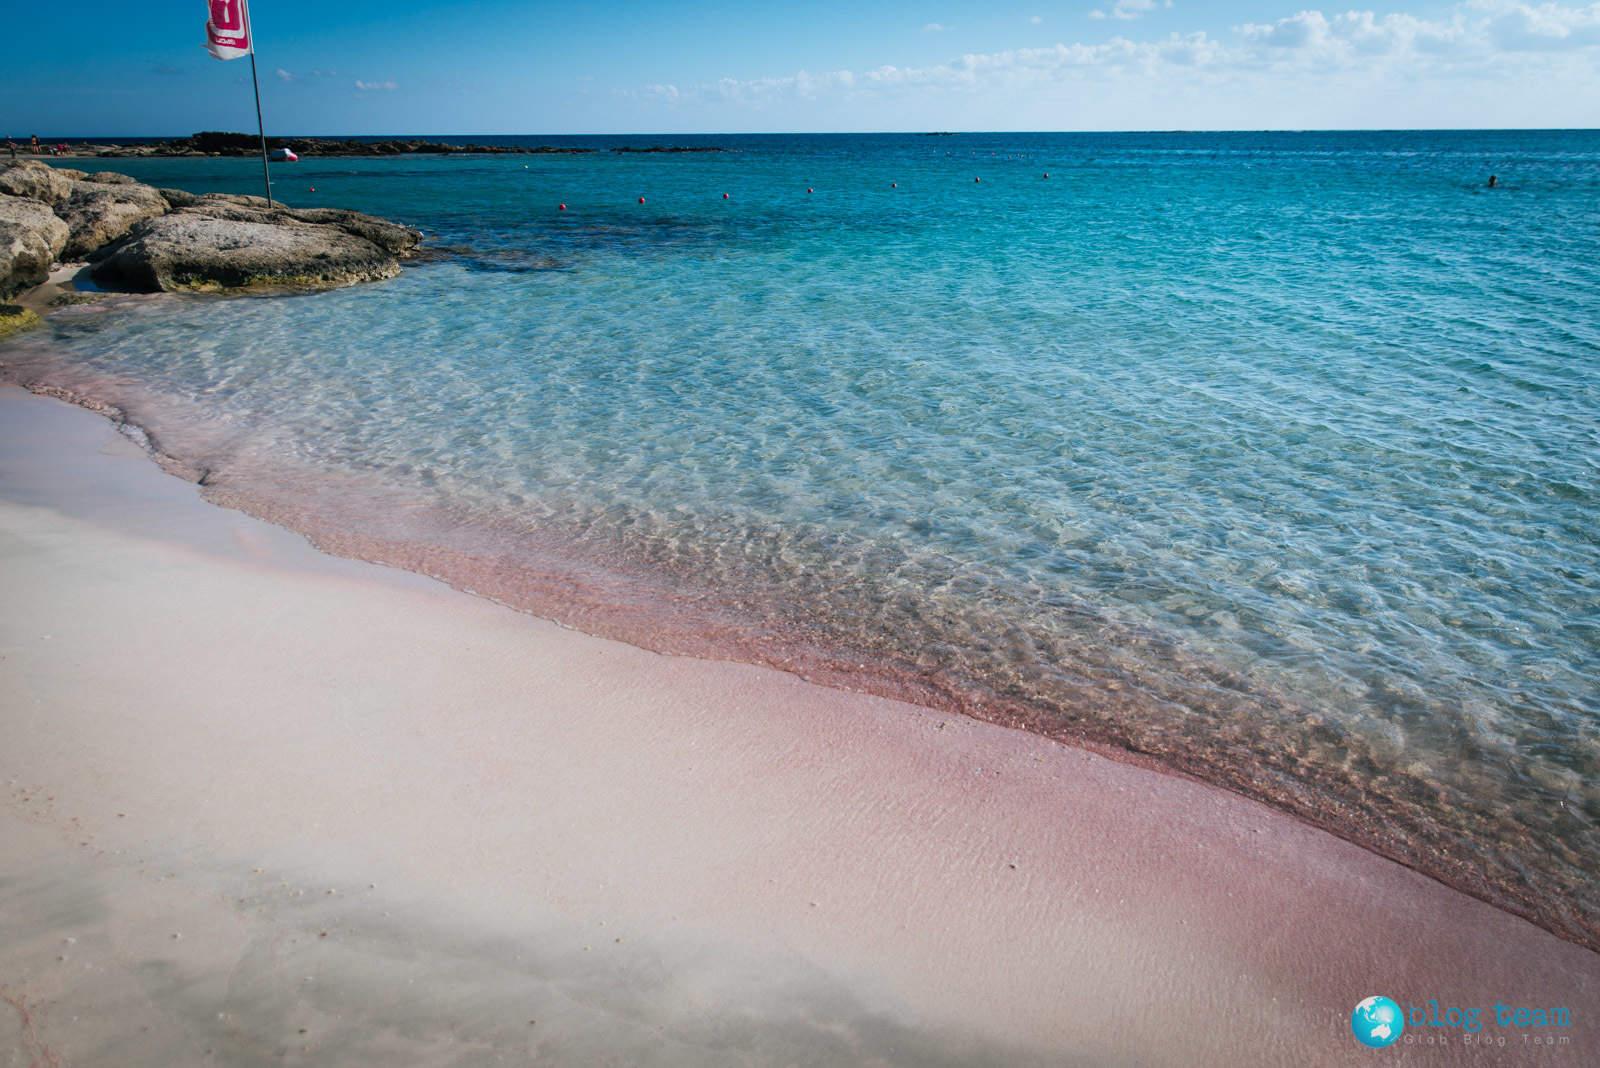 Różowy piasek na Elafonisi / Pink sand Elafonisi